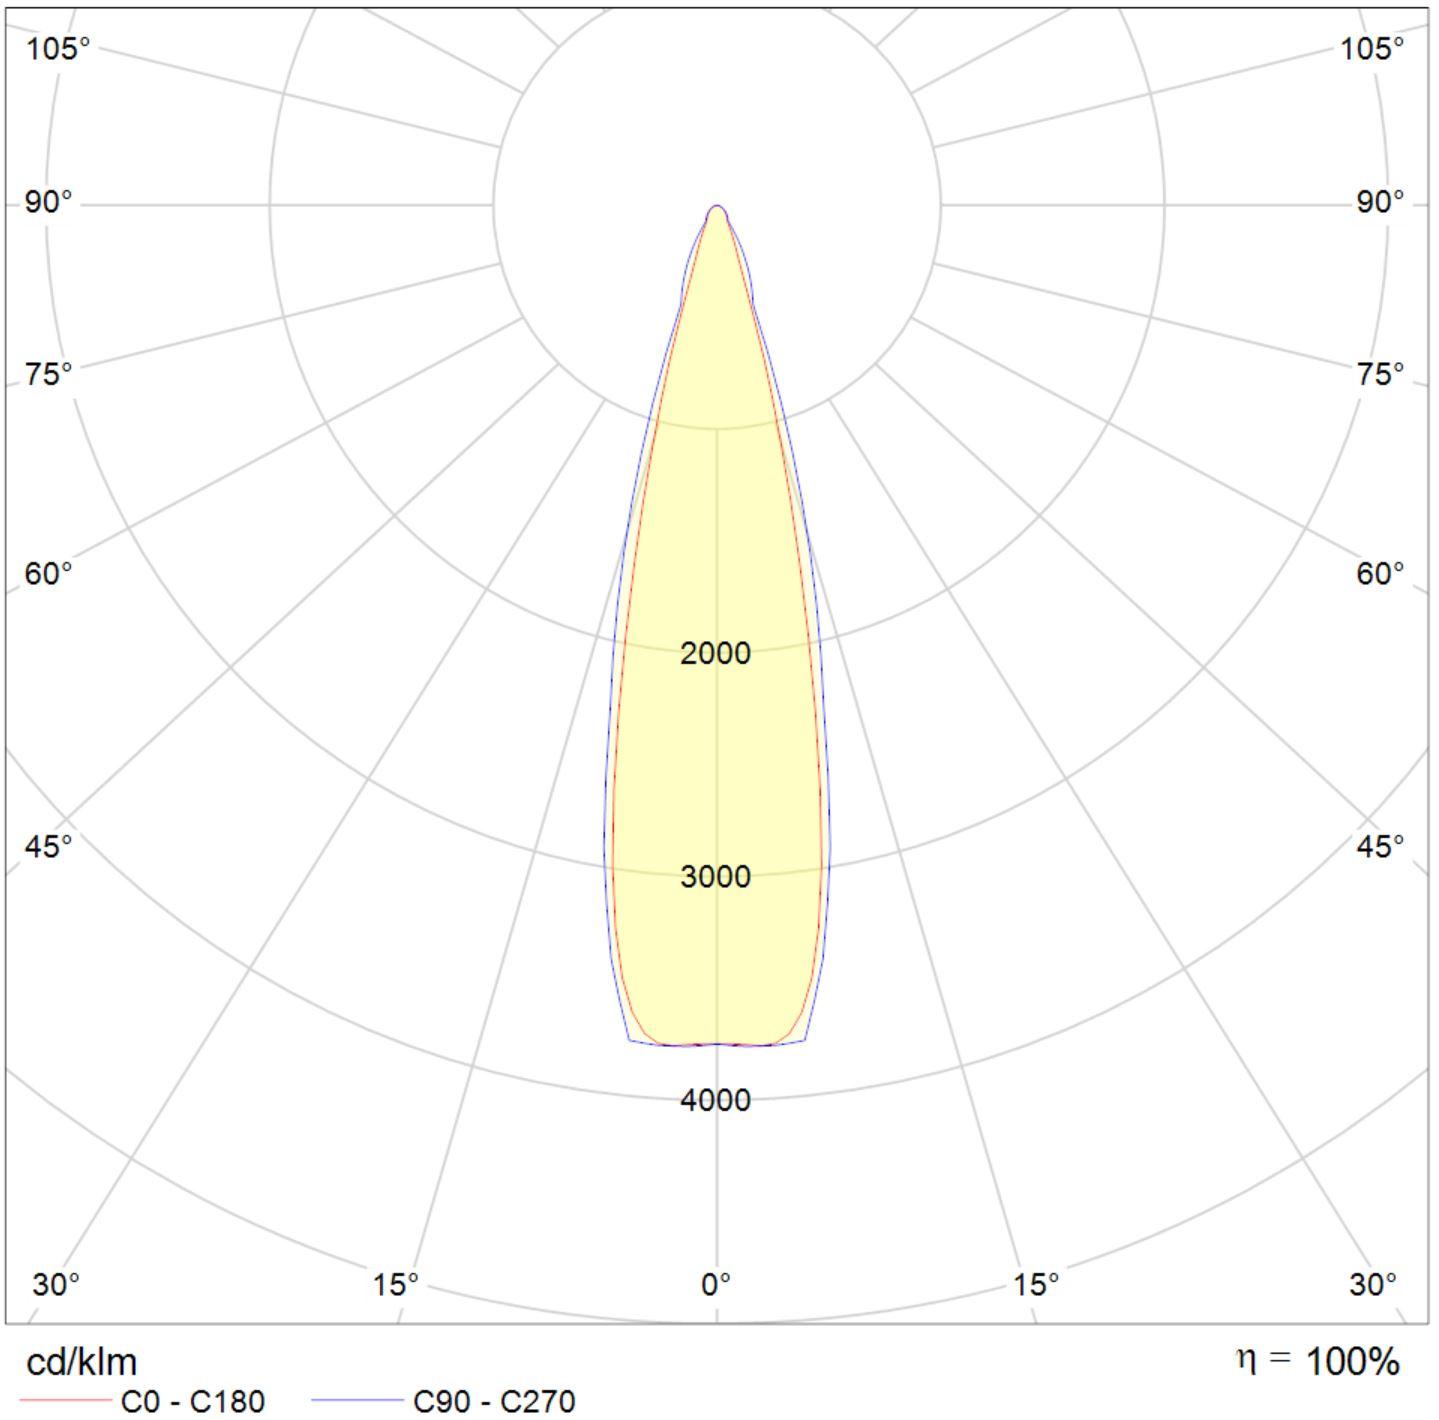 LED Fluter Solax Lichtverteilungskurve 10533